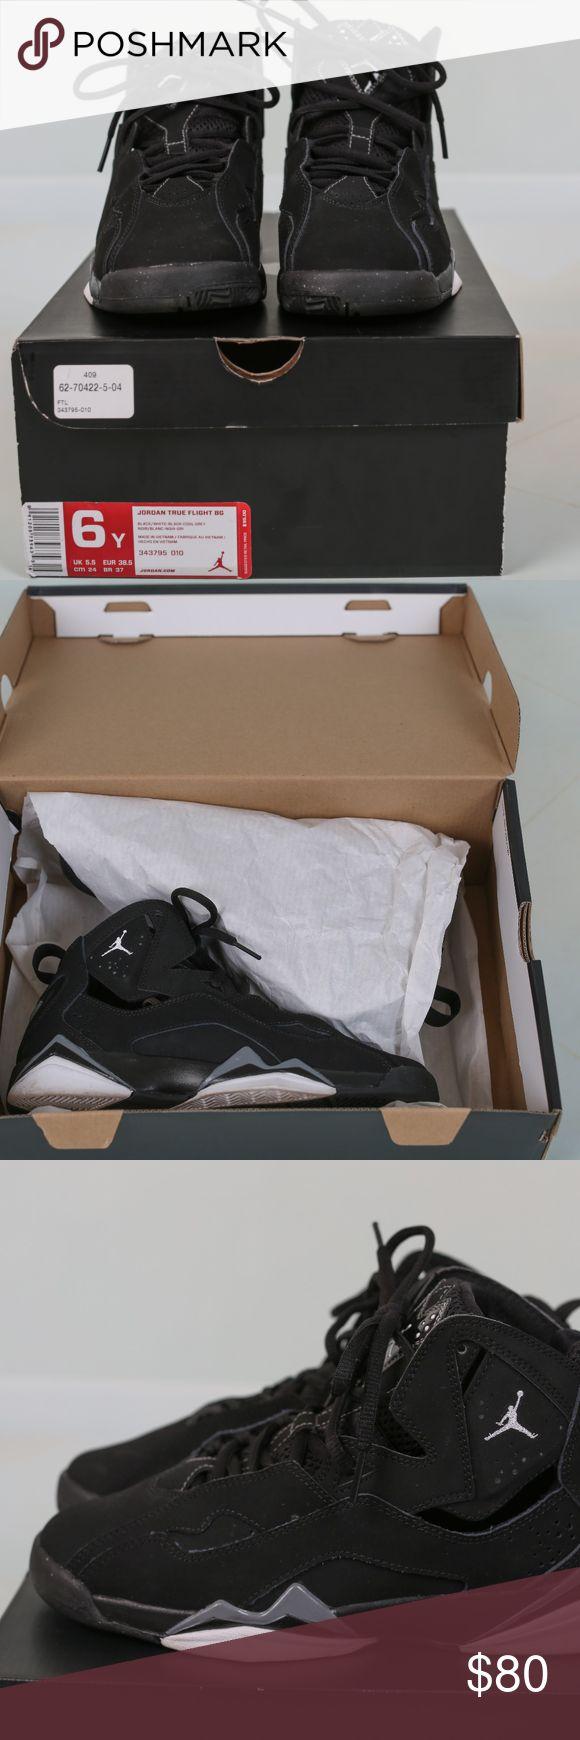 Boys sneakers Jordan True Flight Jordan Shoes Sneakers